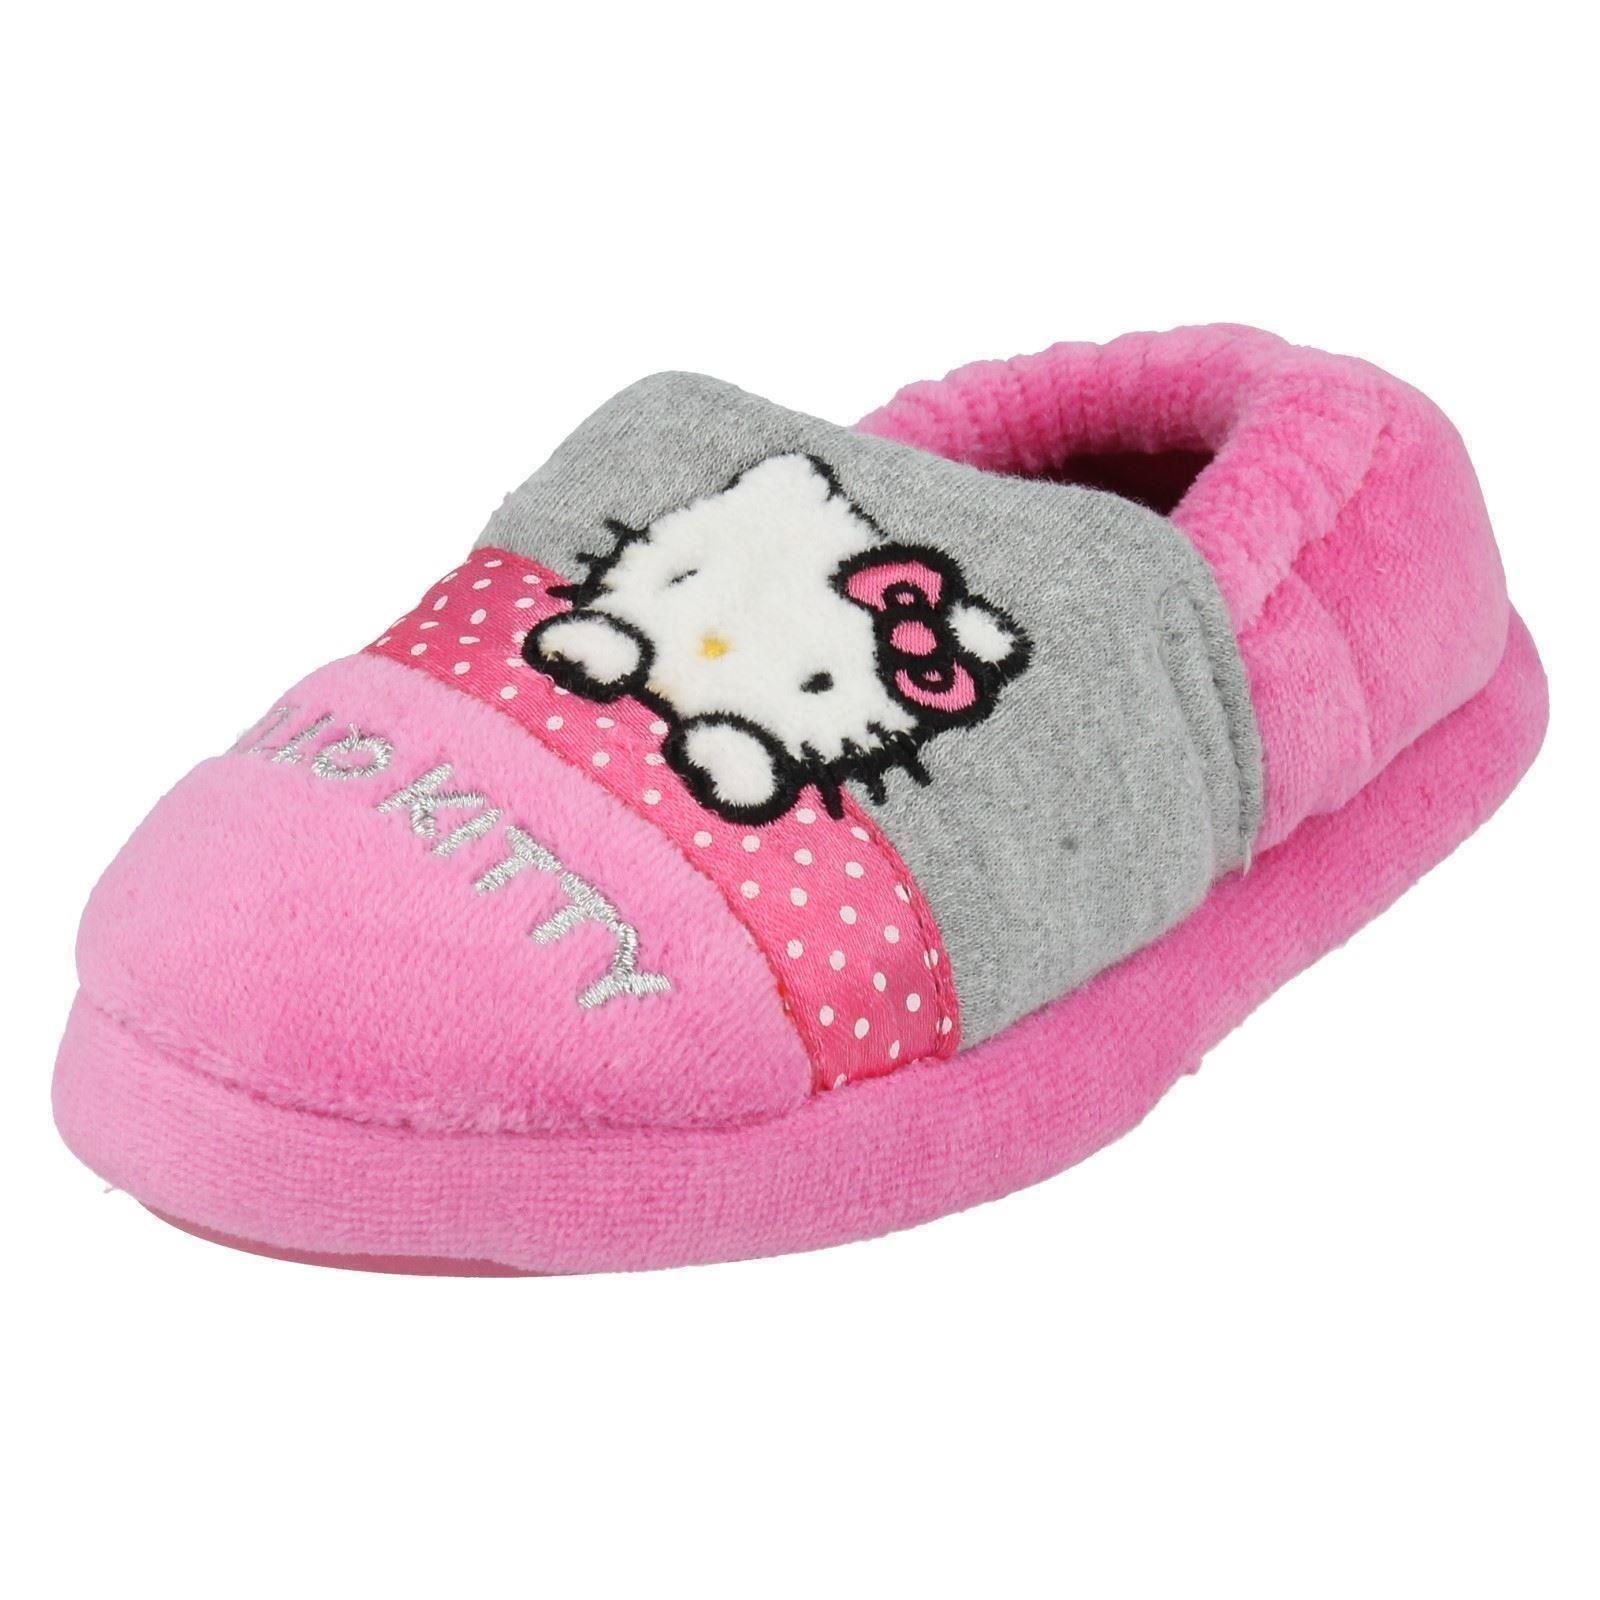 Niñas Hello kittey Zapatillas Etiqueta Persa